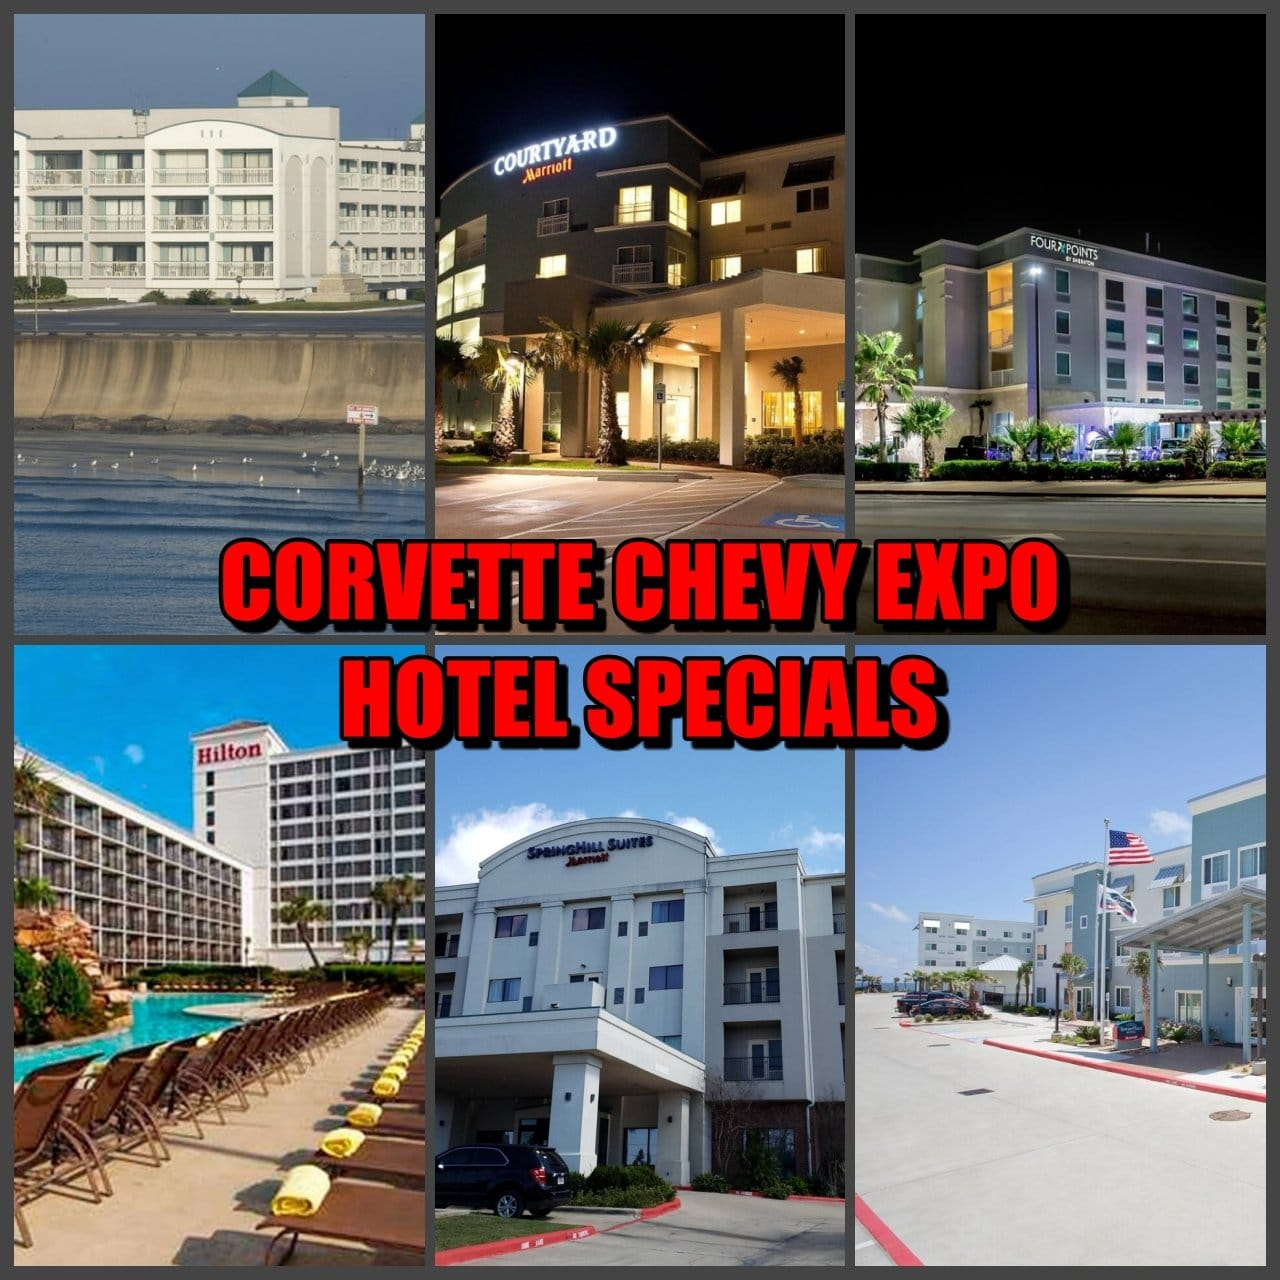 CORVETTE CHEVY EXPO HOTEL SPECIALS